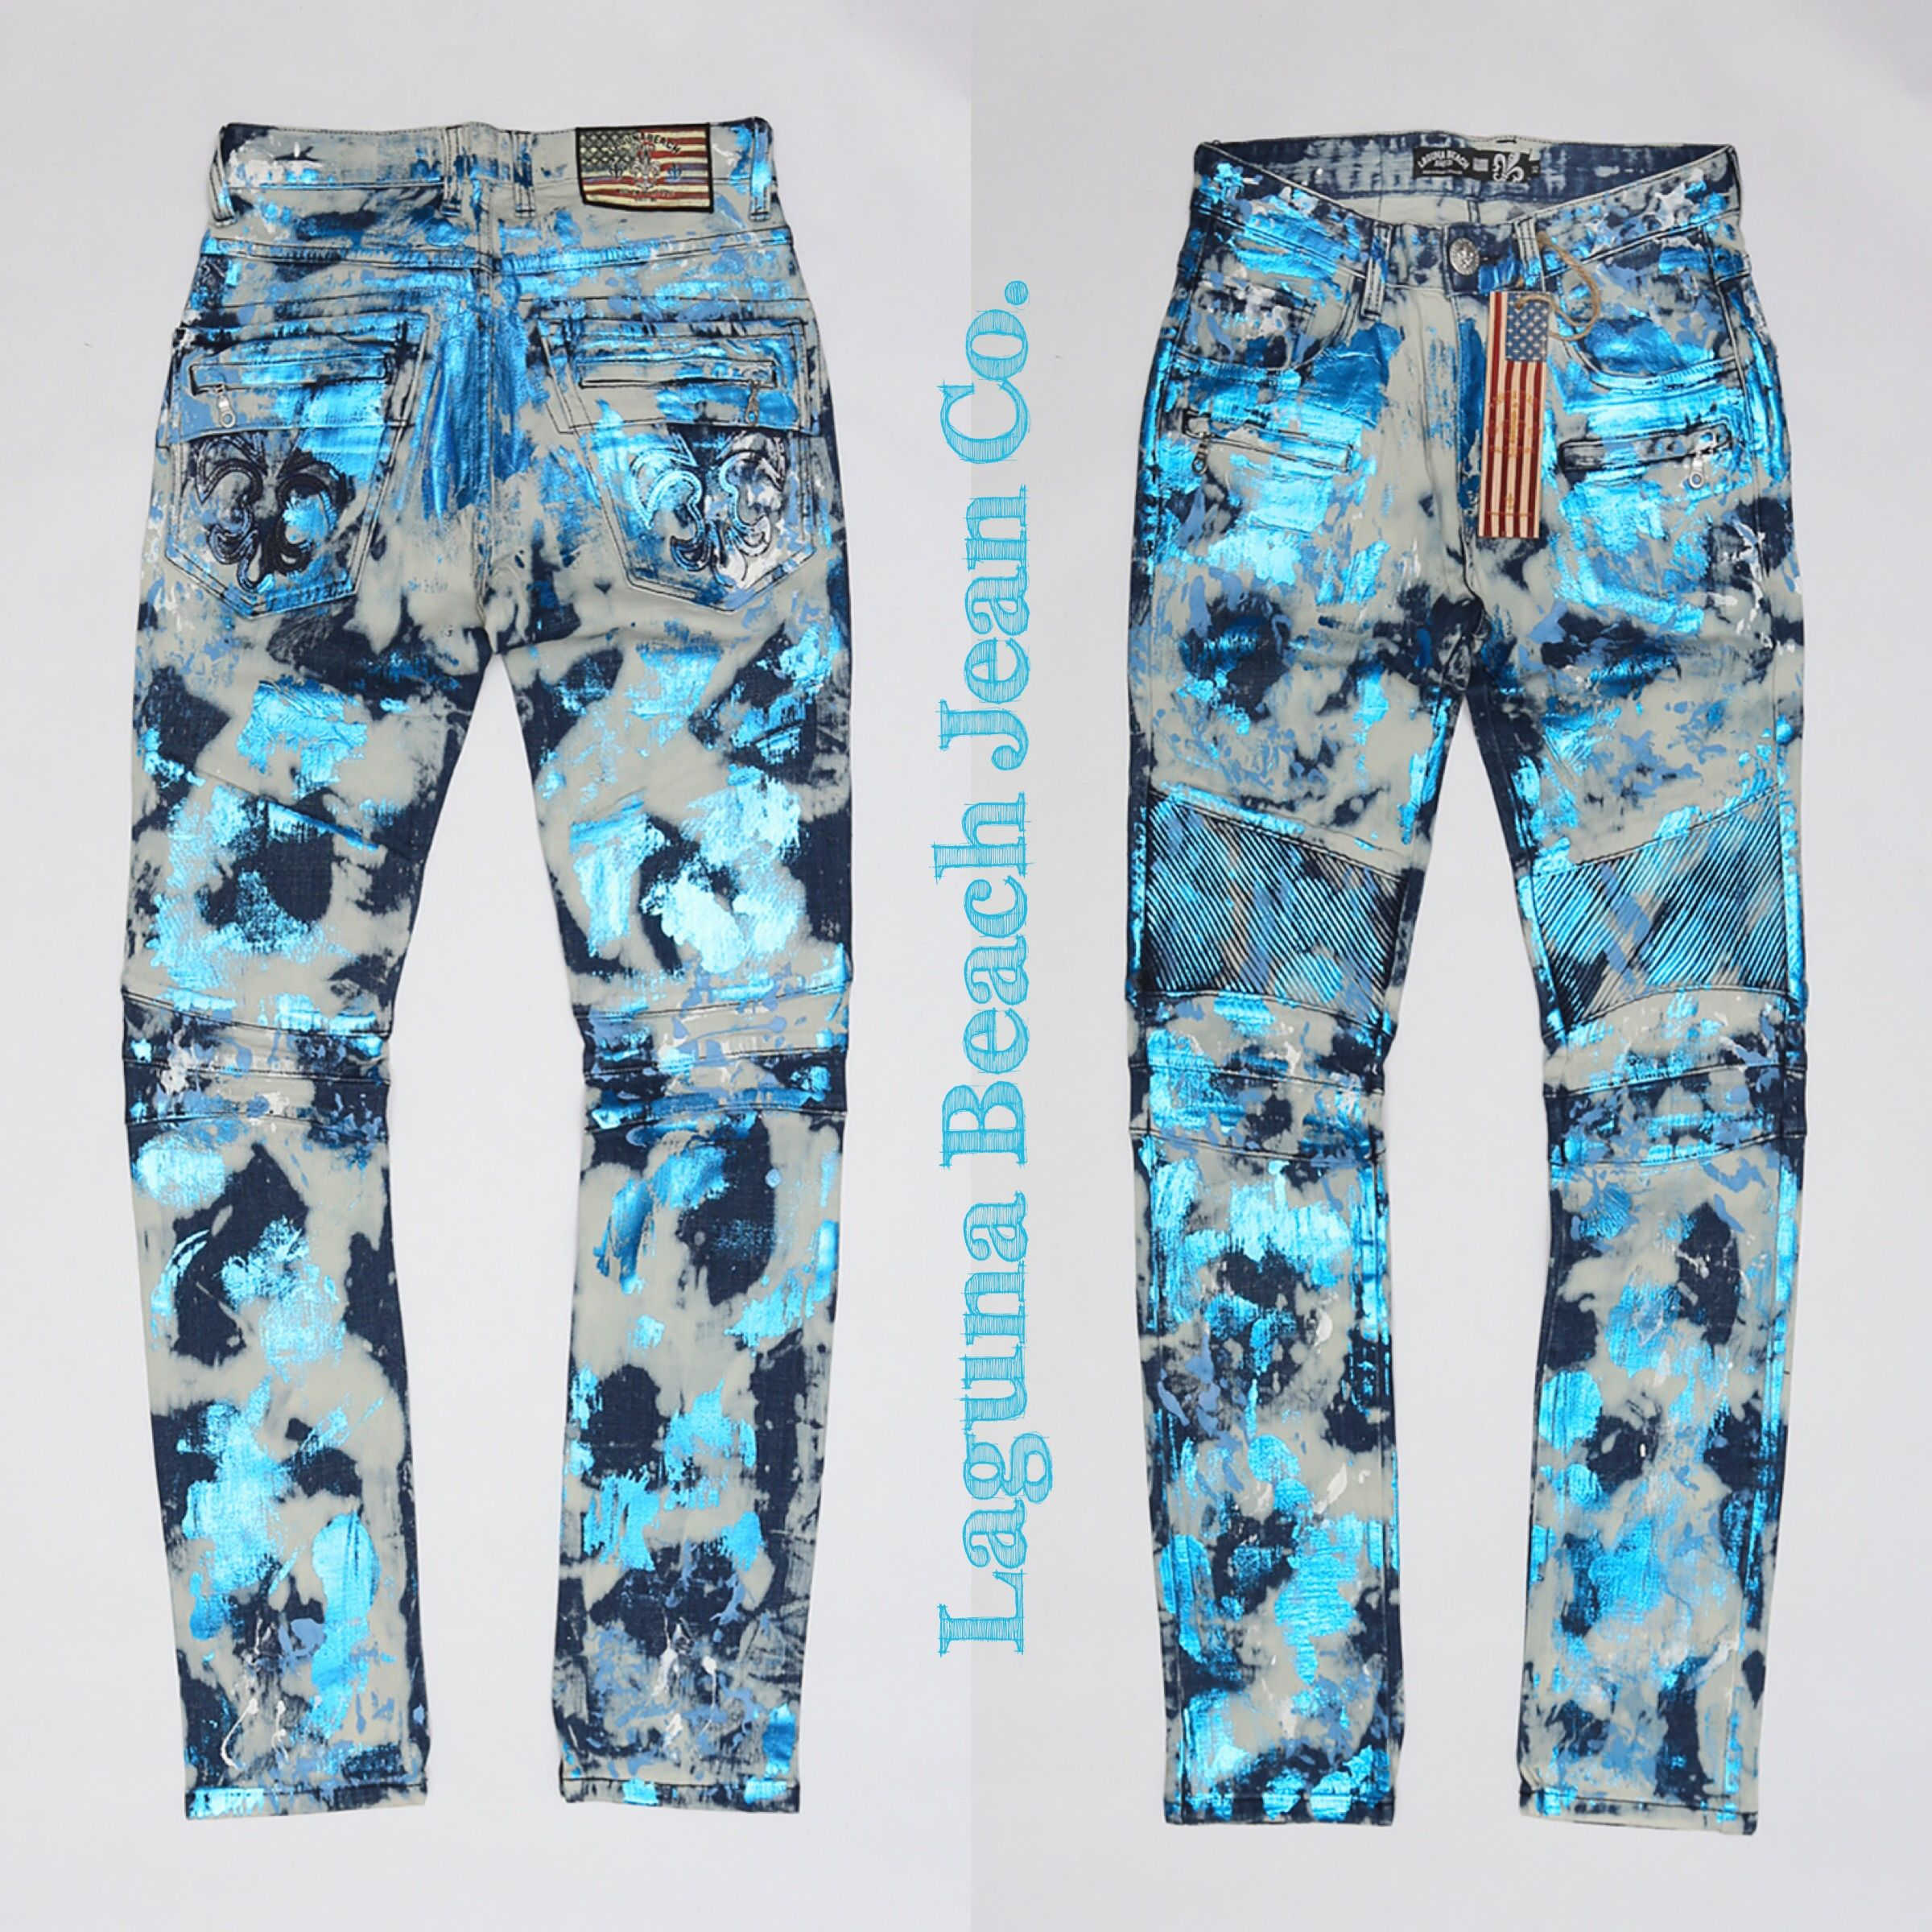 NEW Laguna Beach Jean Co. Foil Print Jeans 👖 available online: http://lagunabeachjc.com/products-men.php?cat=Foil-Moto-Jeans ⚜️ #rocktheoclifestyle @lagunabeachjc #lbjcmotojeans #lbjcdenimworld #lbjcdenim #lagunabeachjeanco #swarovskicrystals